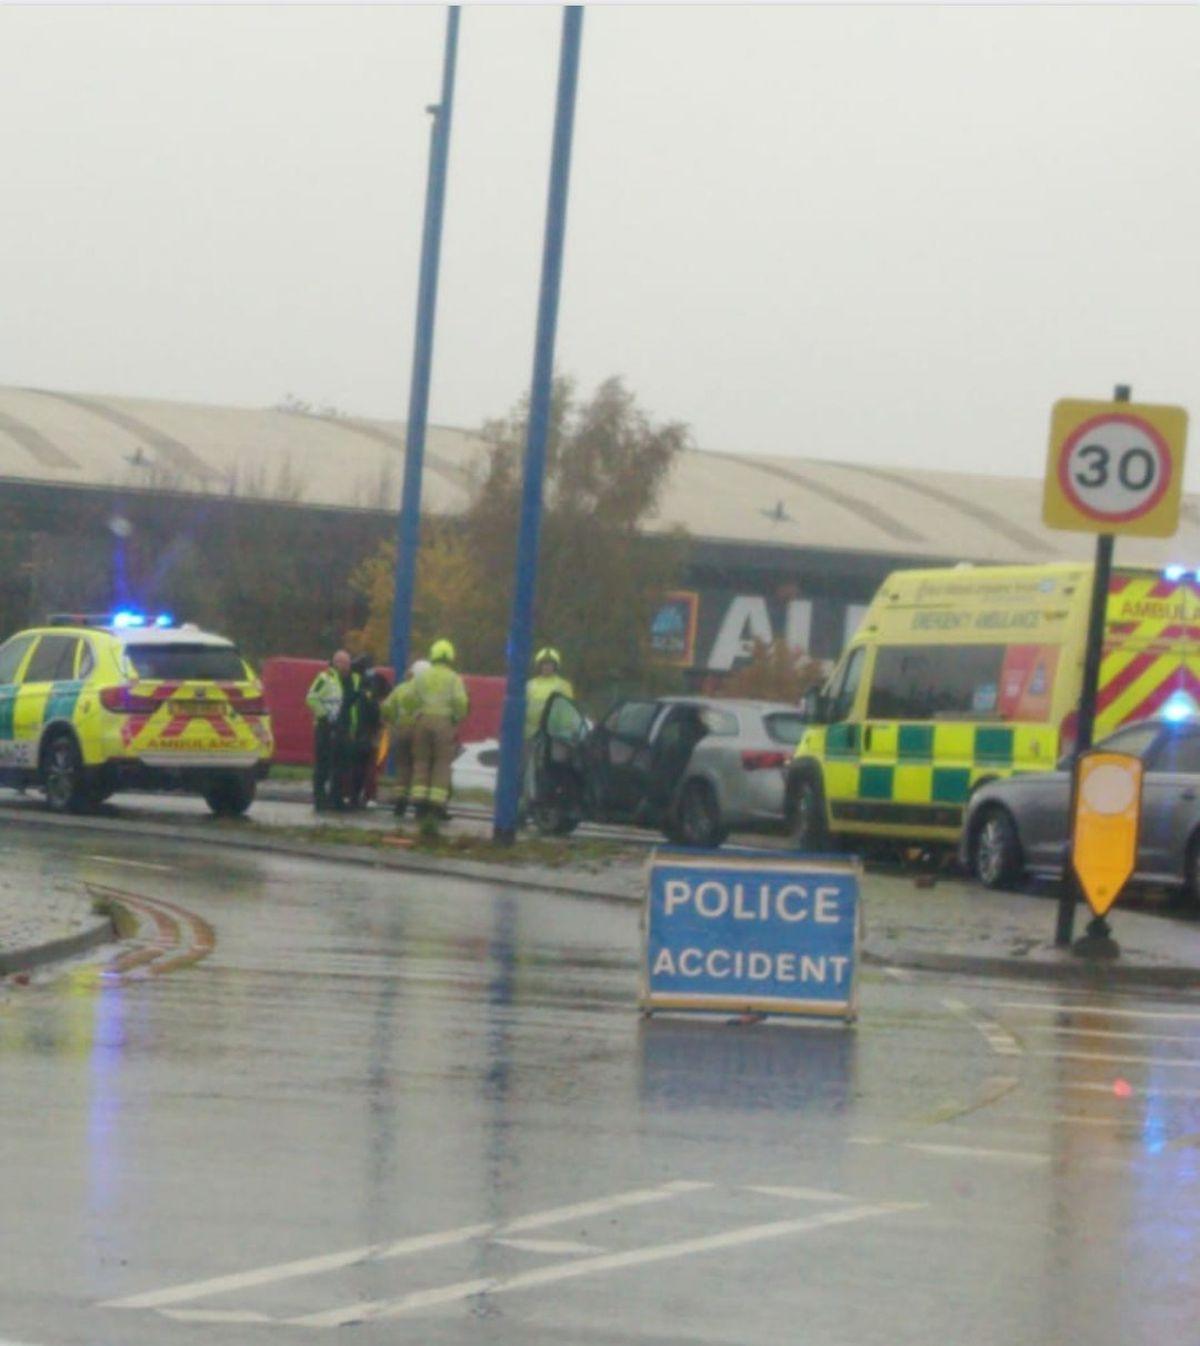 The scene of the crash. Photo: @WilkesSouth